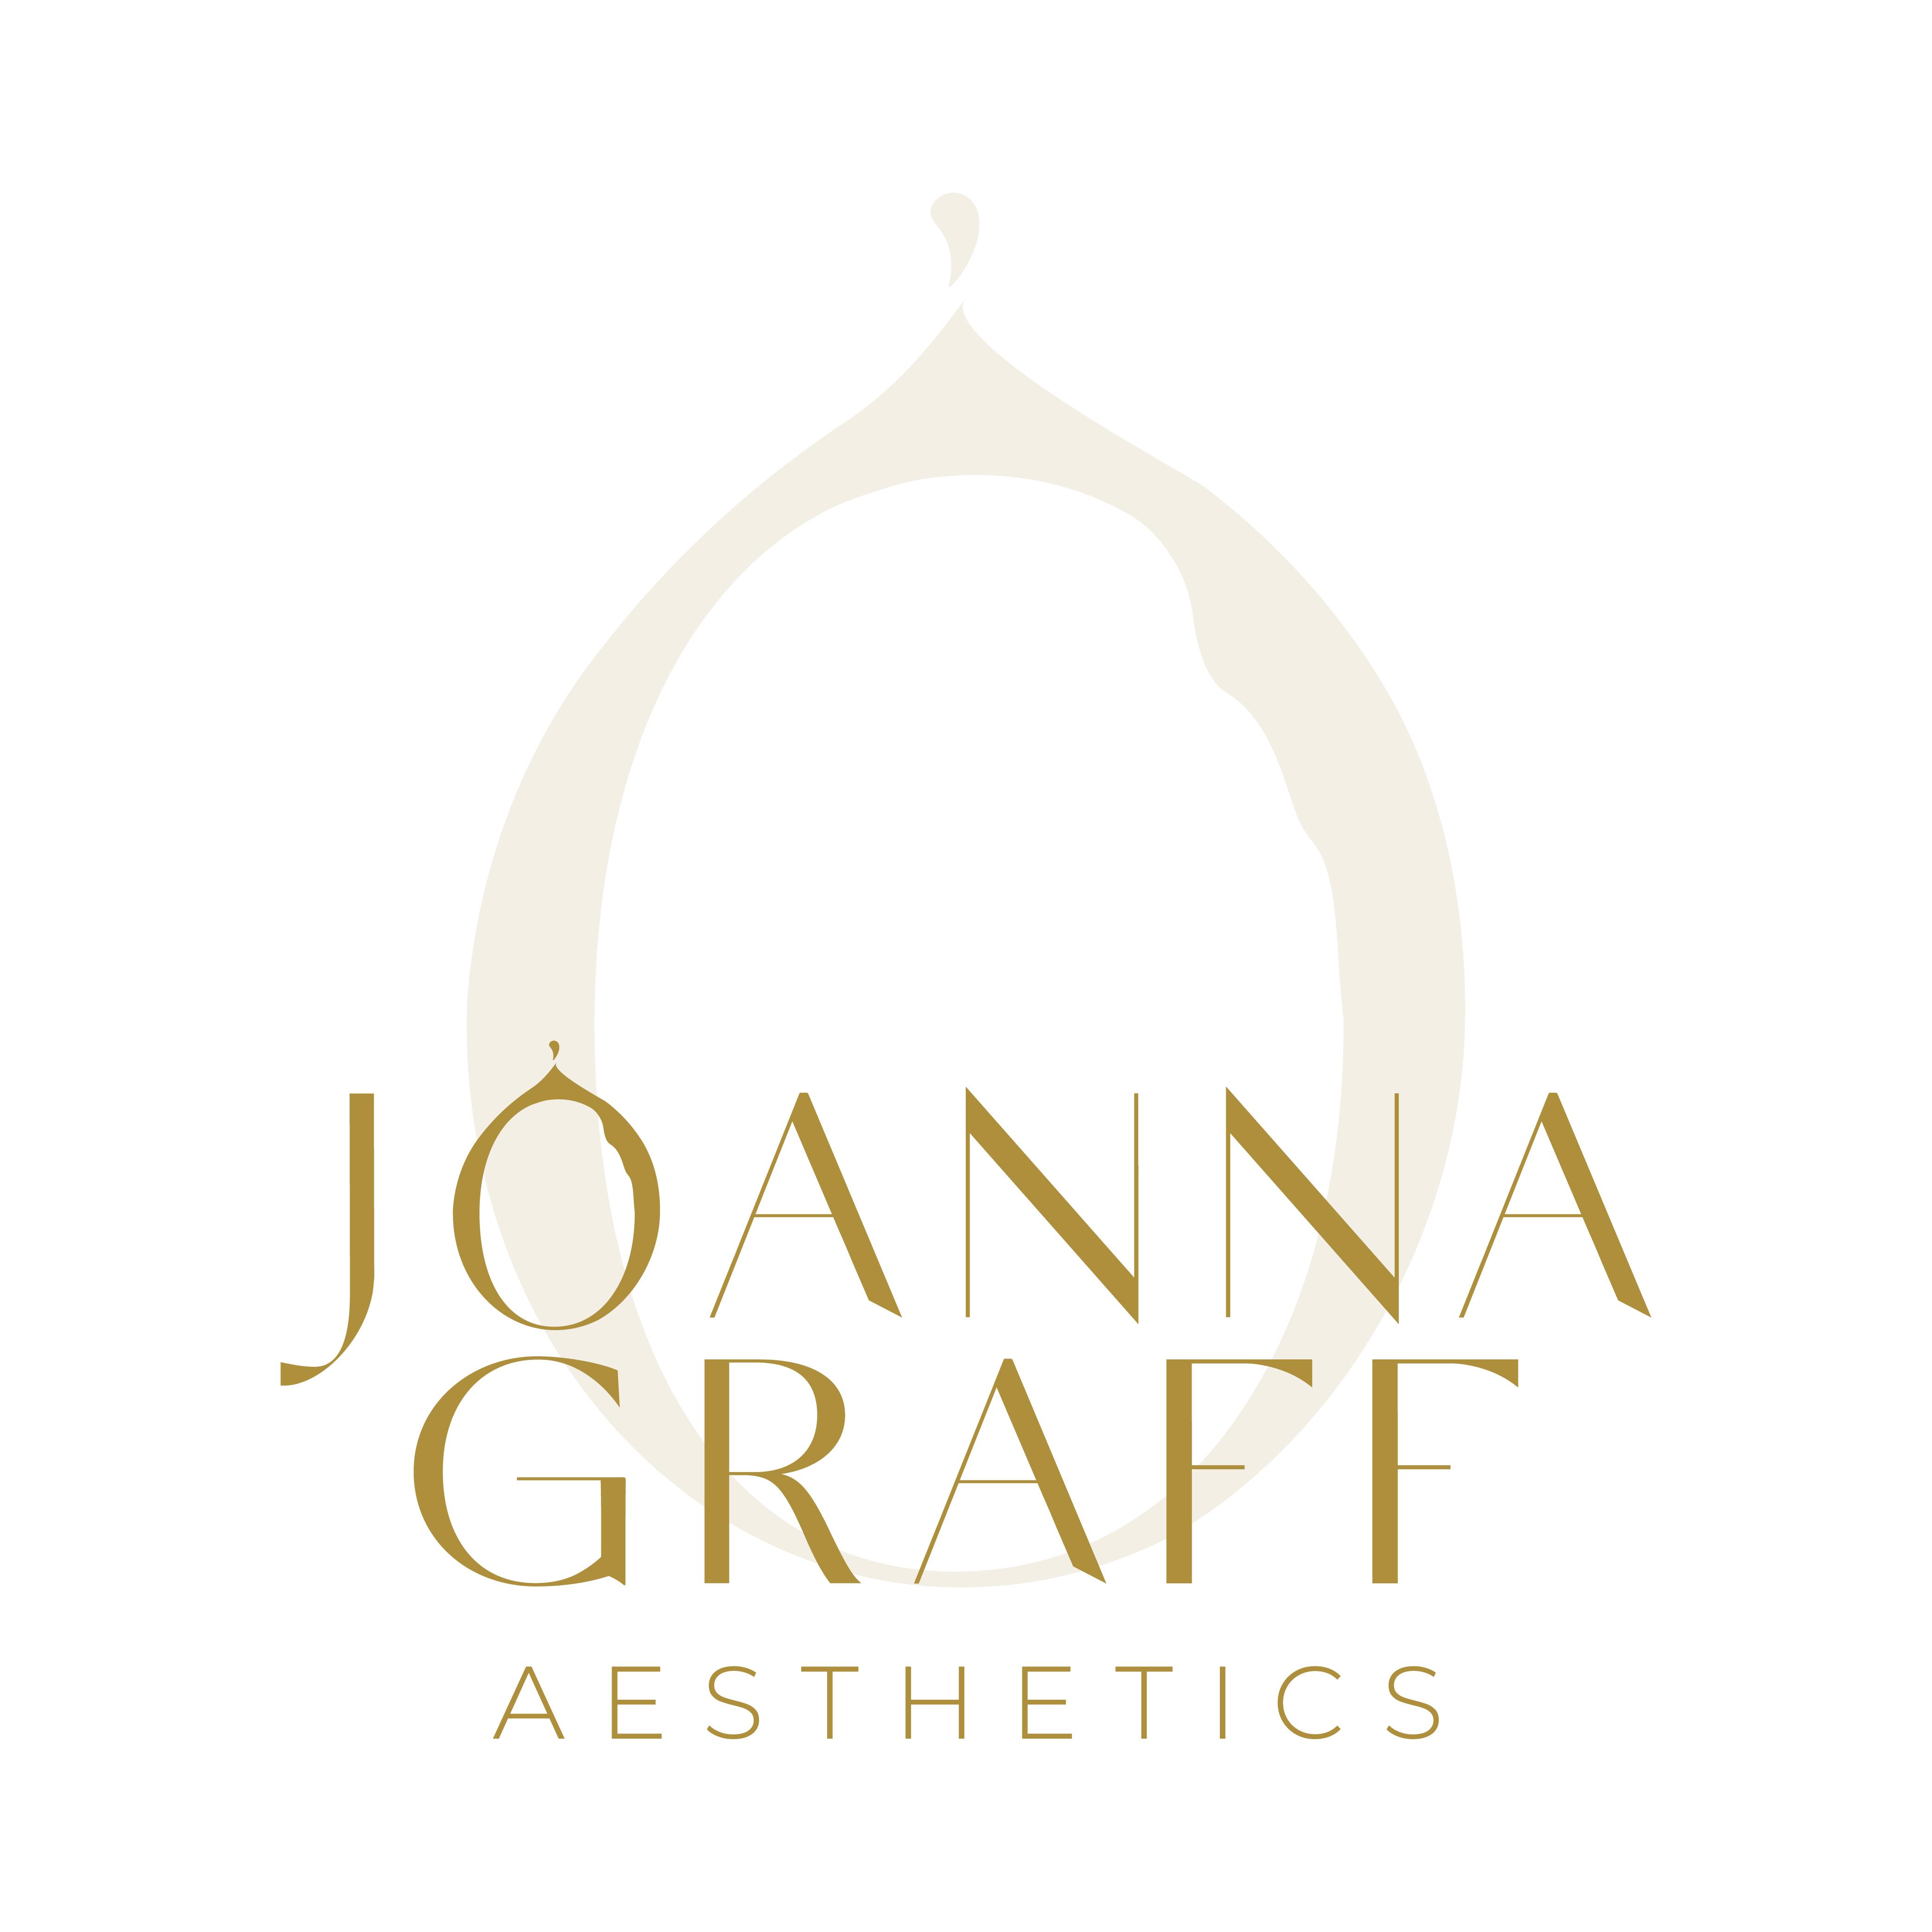 Logo of Joanna Graff Aesthetics Aesthetics In Shrewsbury, West Midlands